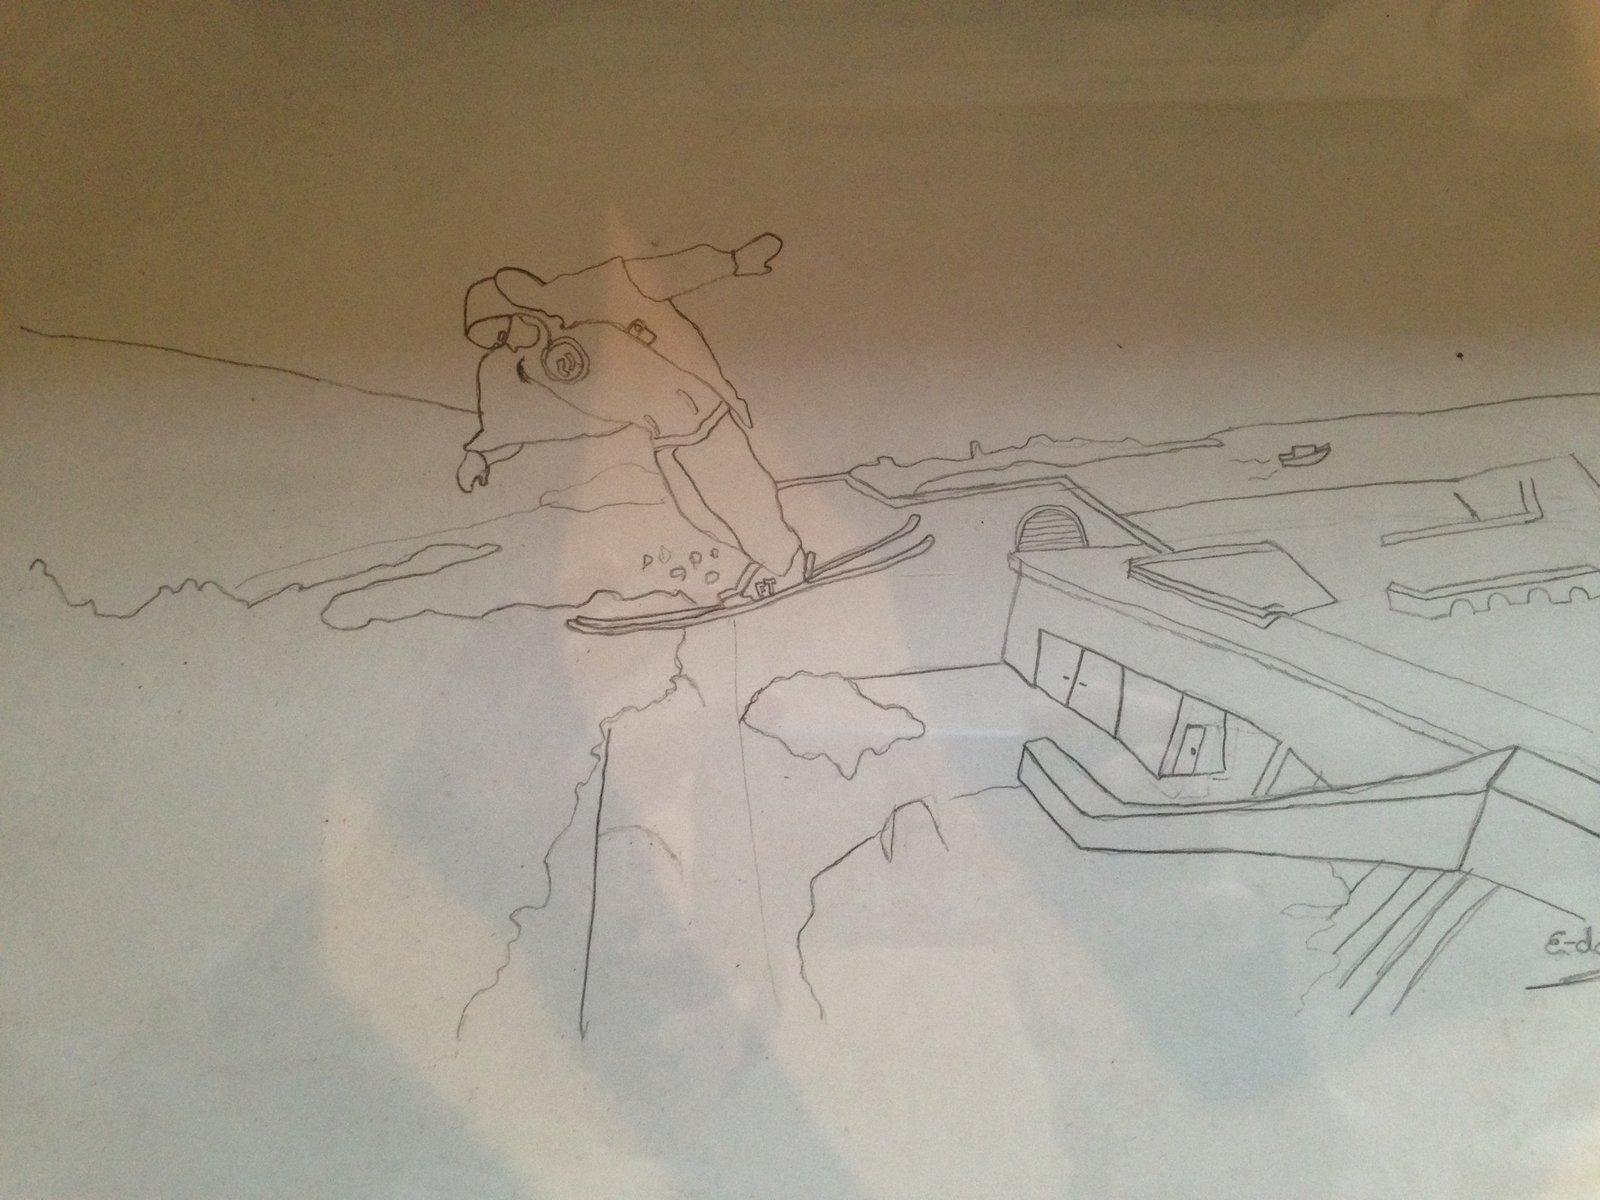 Oil&Water doodle